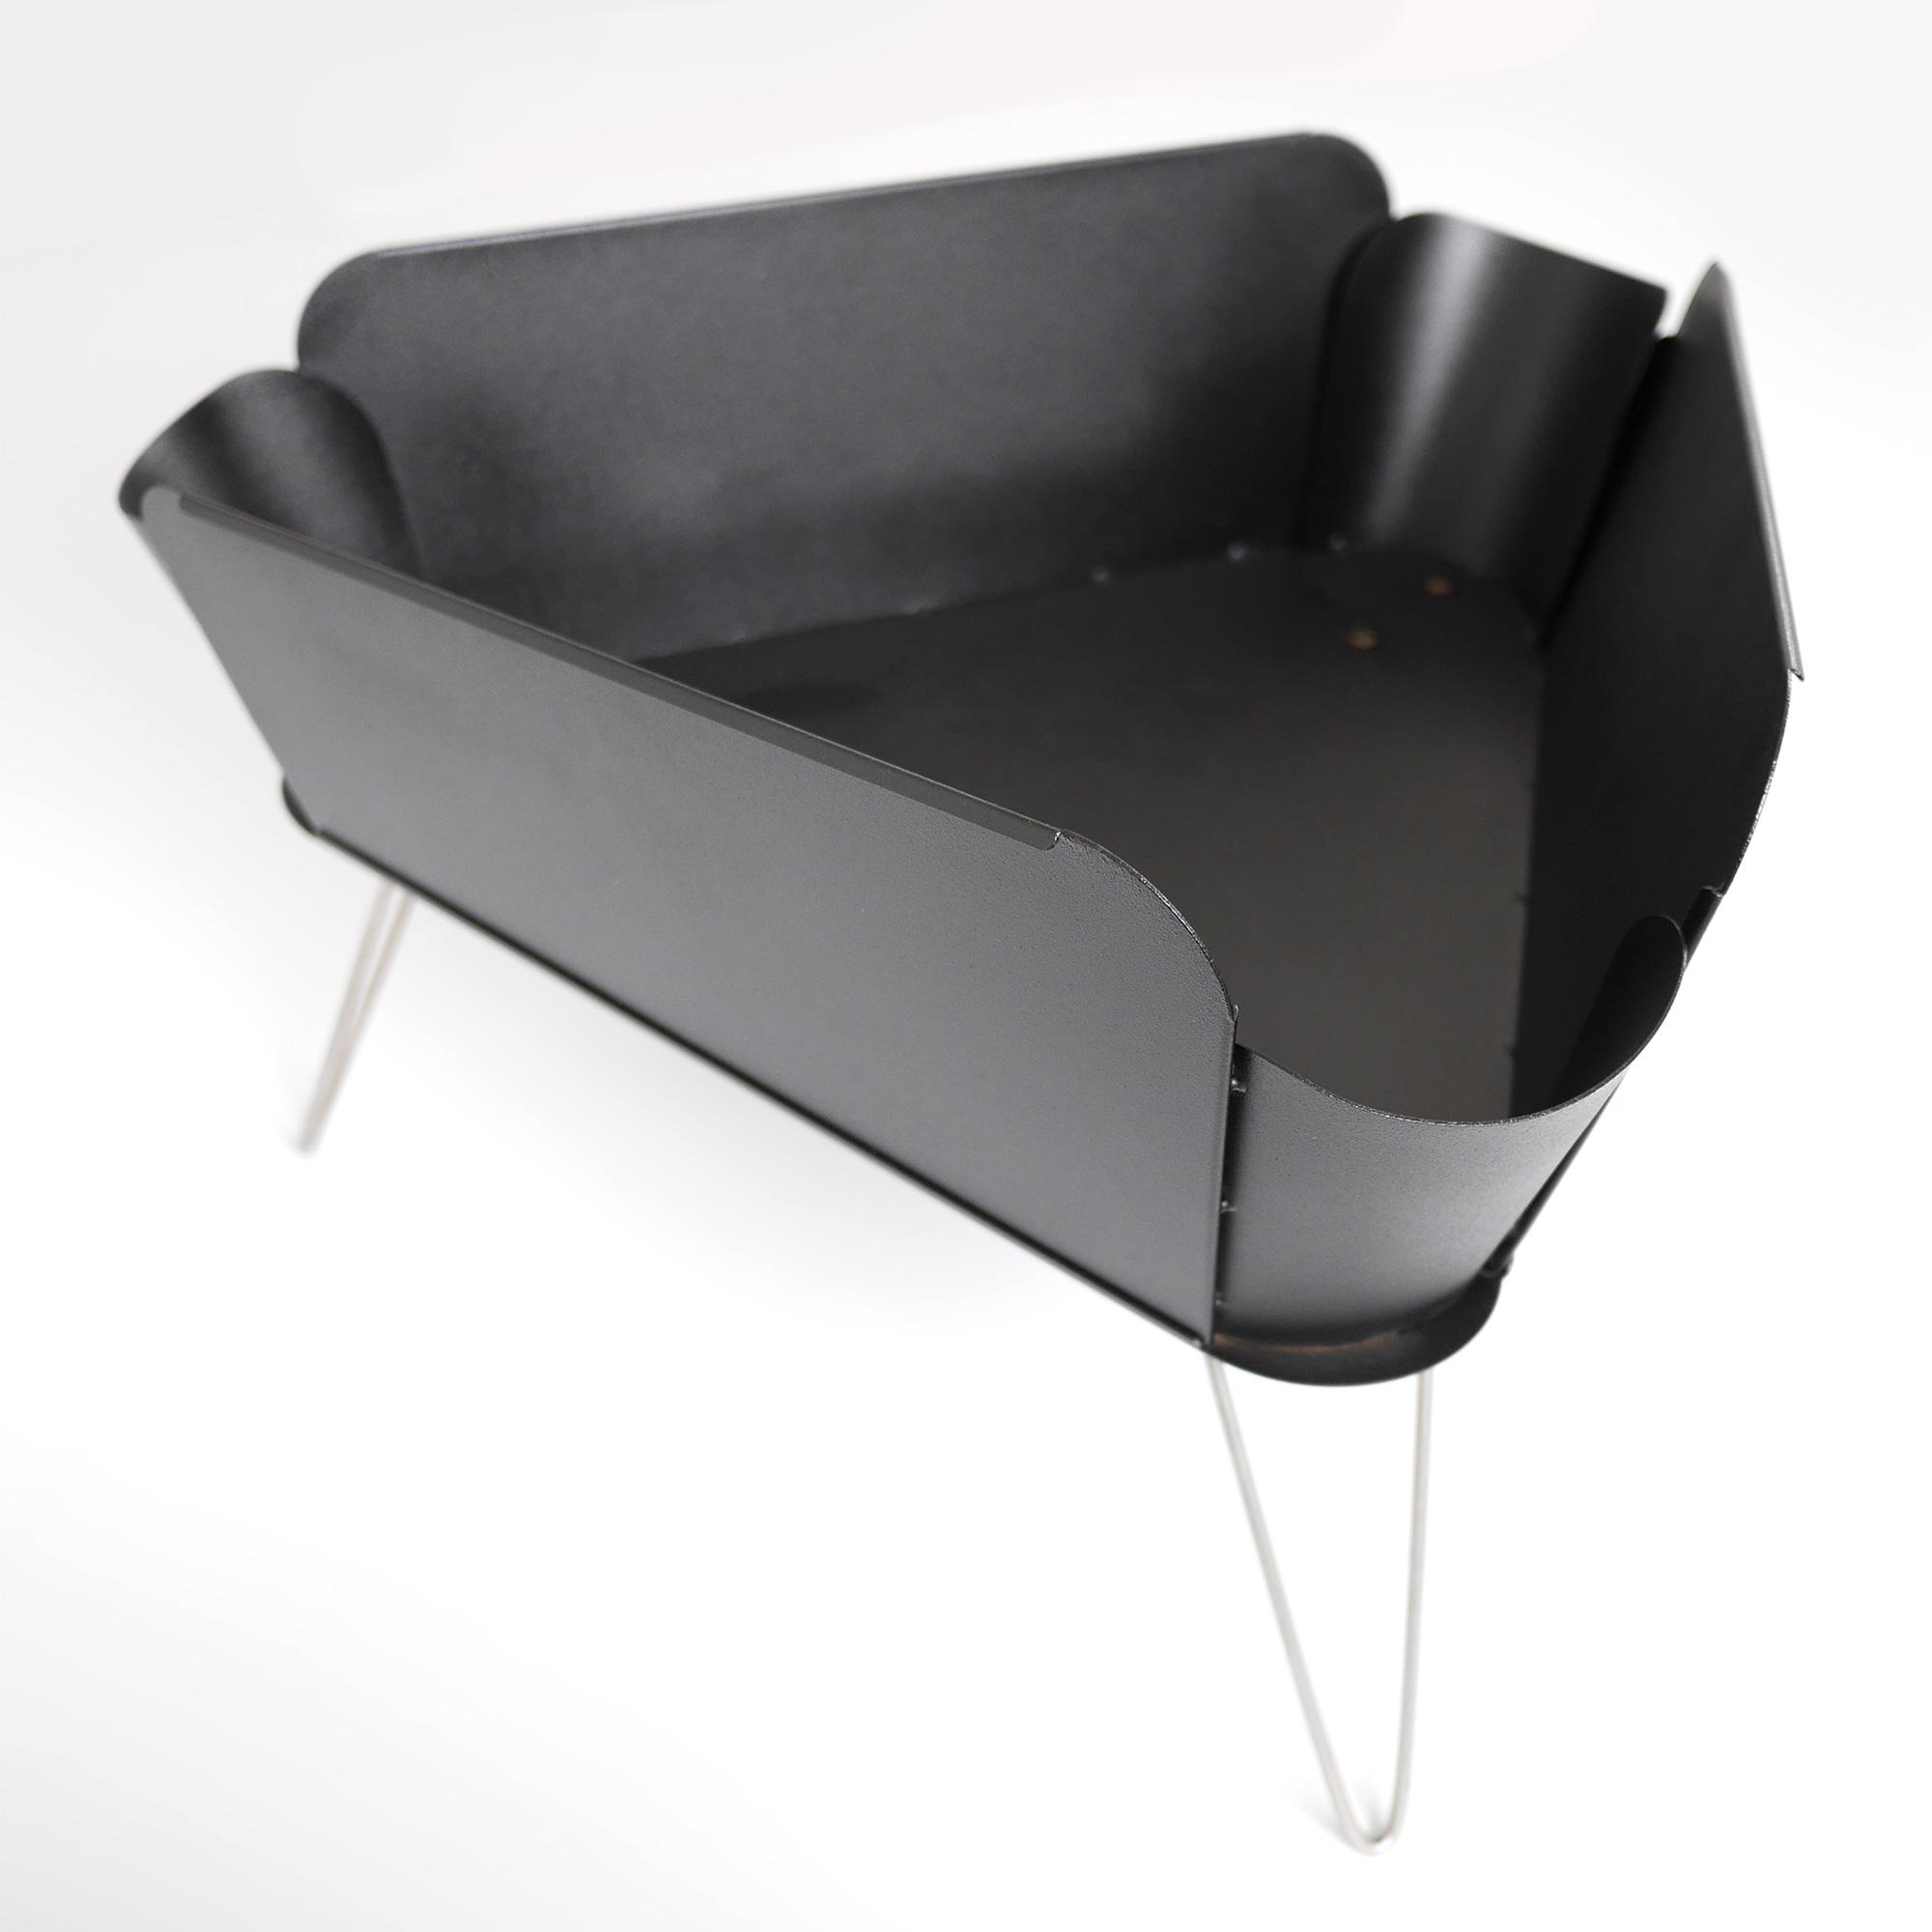 edelstahl design cheap edelstahl designobjek with edelstahl design simple weras gmbh. Black Bedroom Furniture Sets. Home Design Ideas